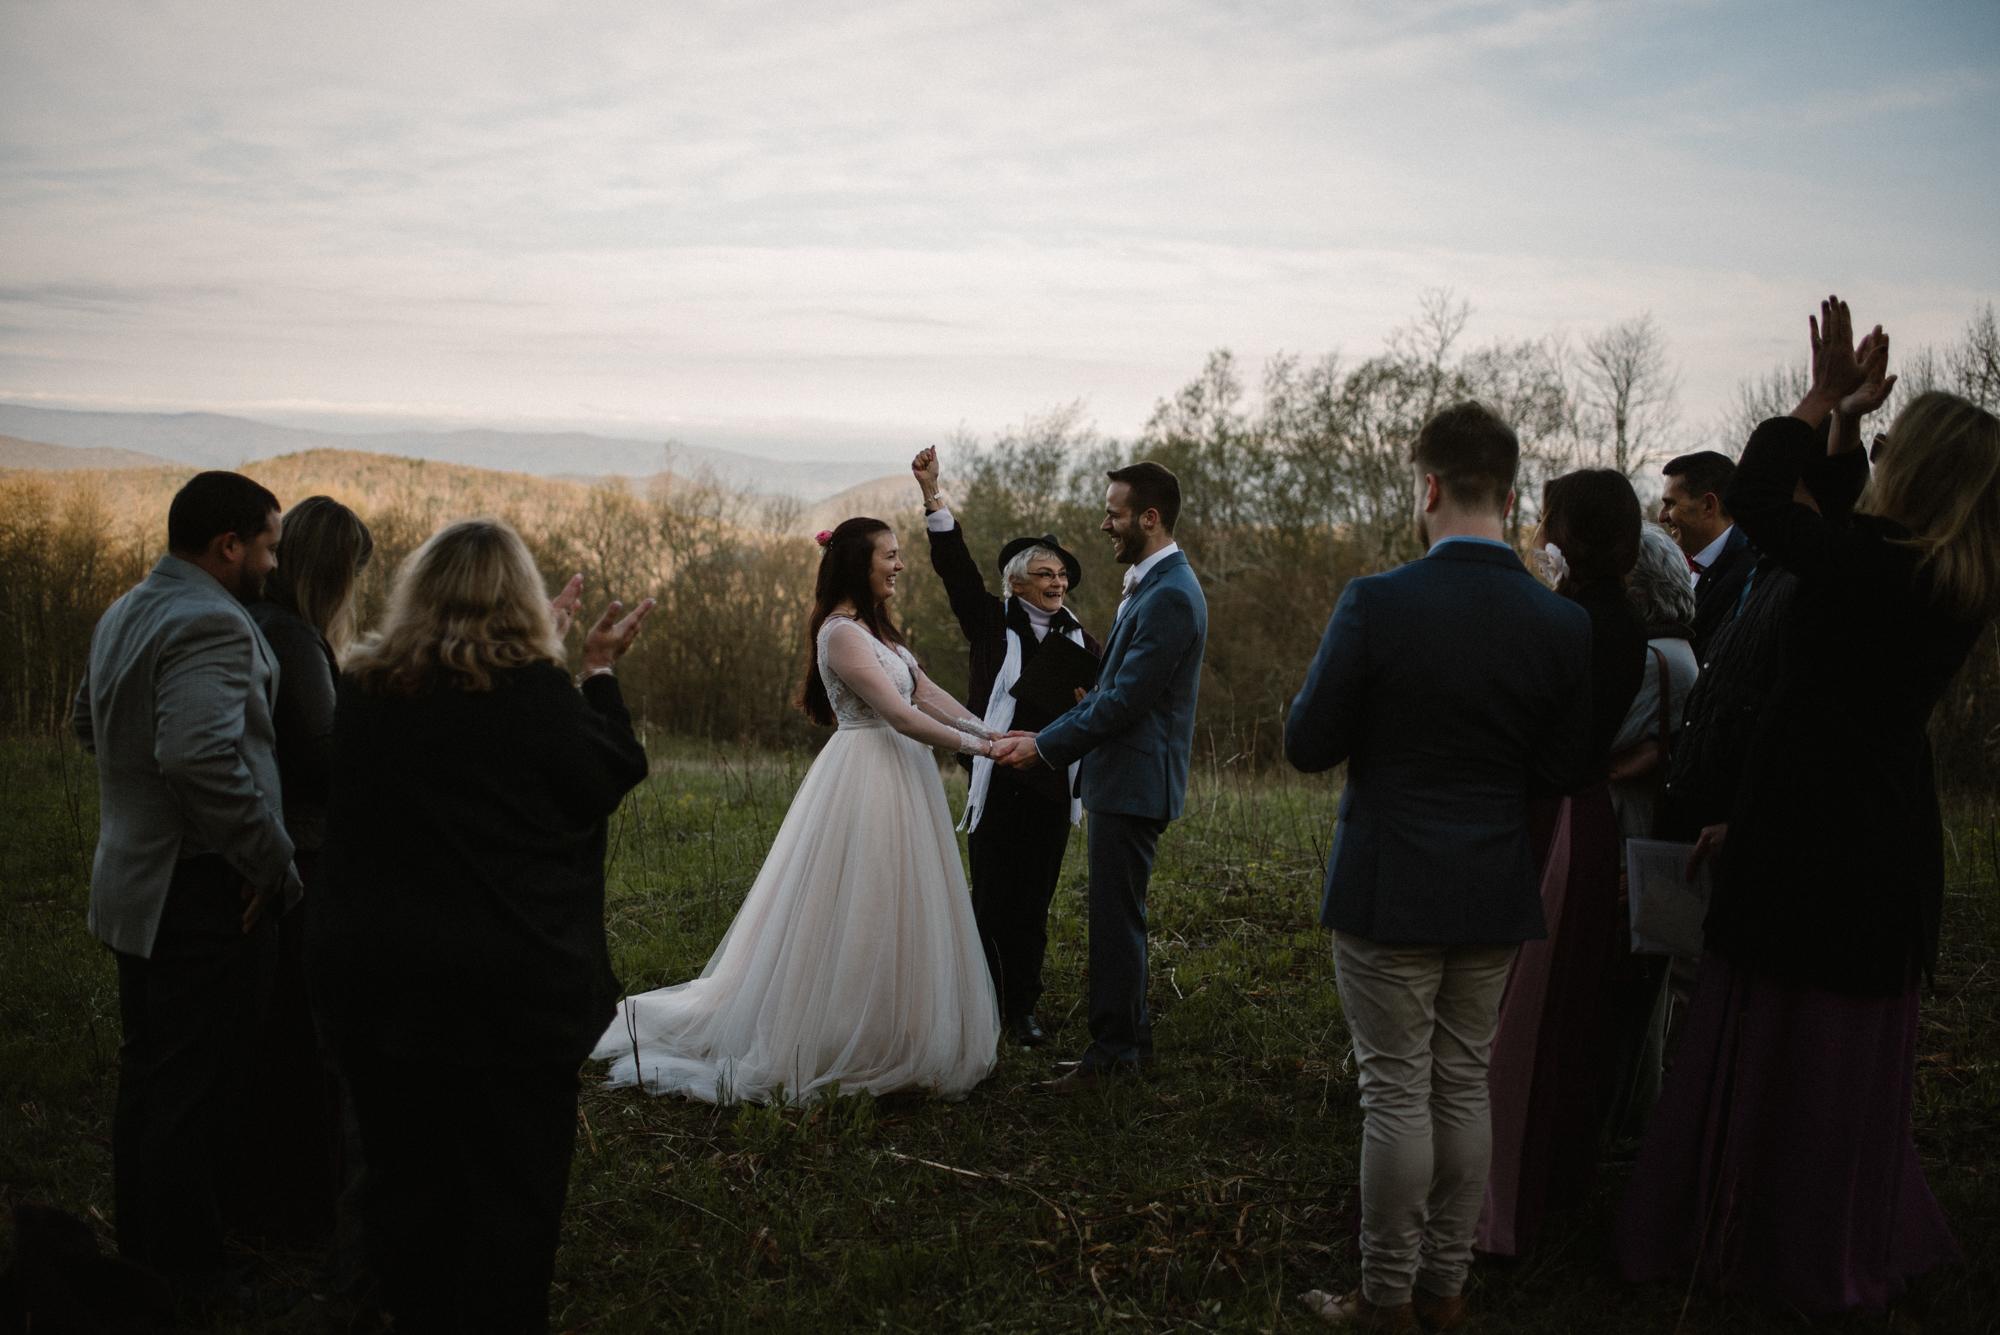 Paula and Andrew - Small Adventurous Wedding in Shenandoah National Park - Blue Ridge Mountain Wedding - White Sails Creative - Mountain Elopement_19.jpg